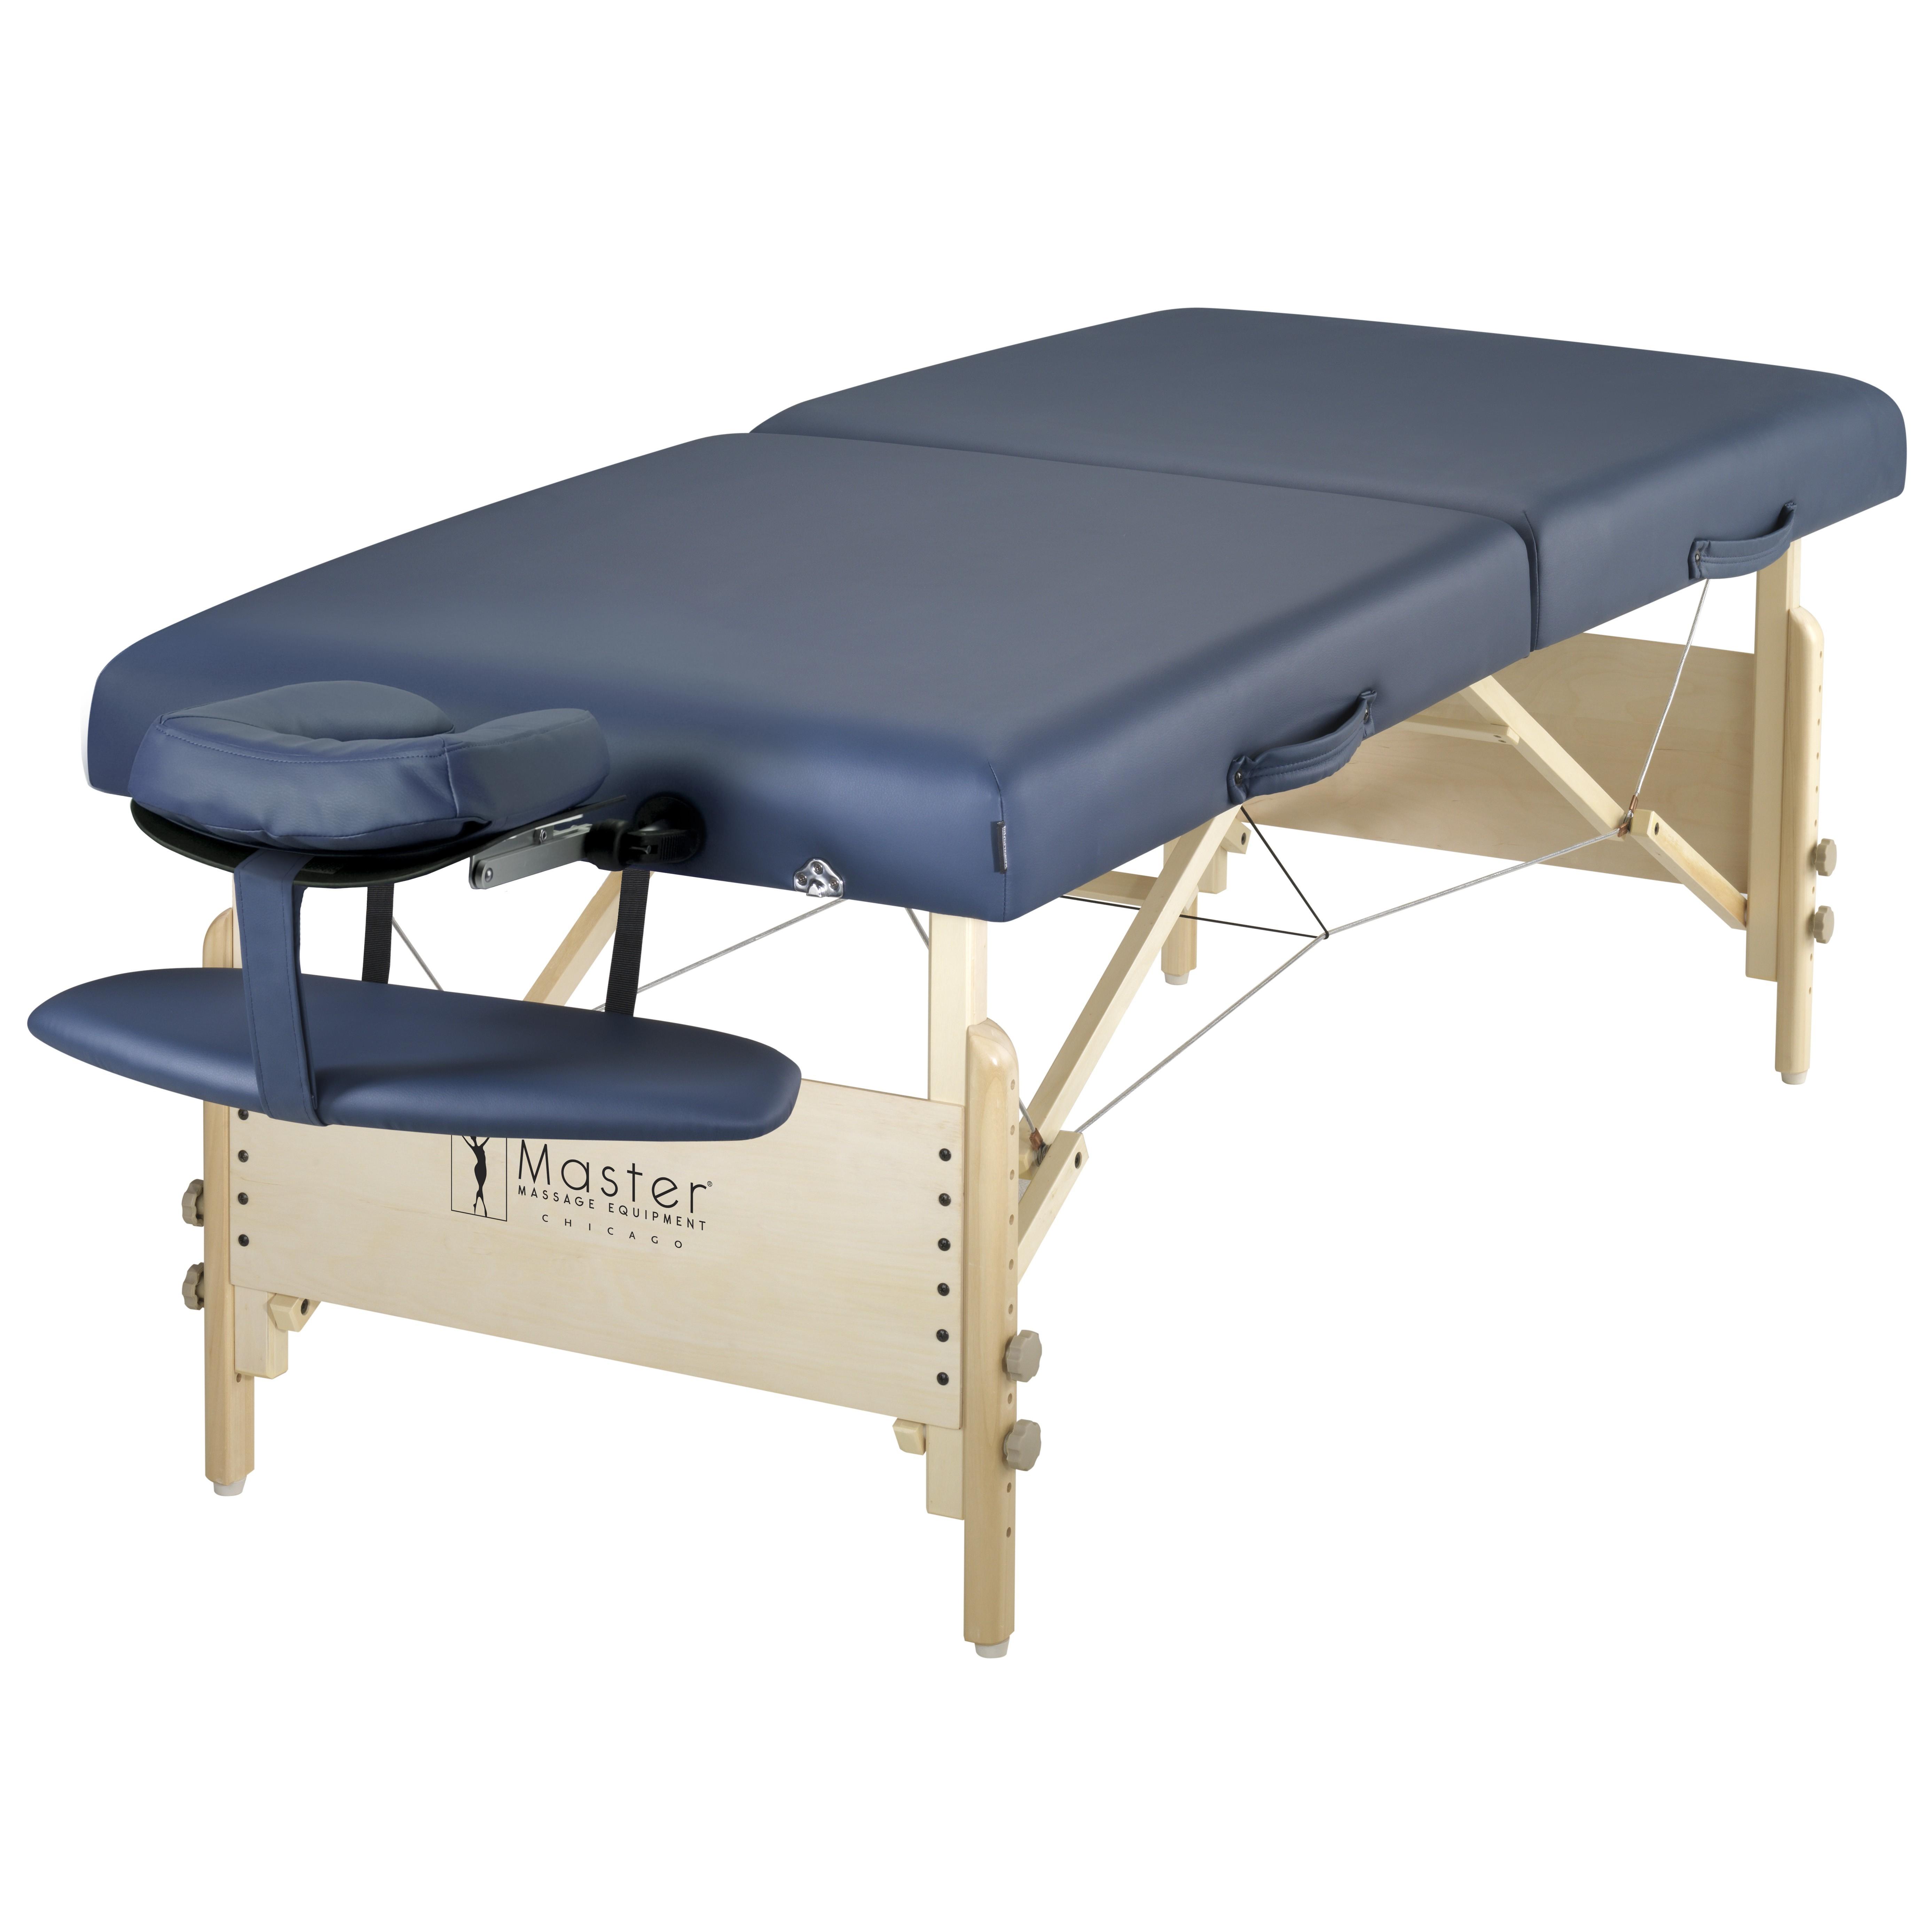 Master 30 Coronado Folding Portable Spa Massage Table